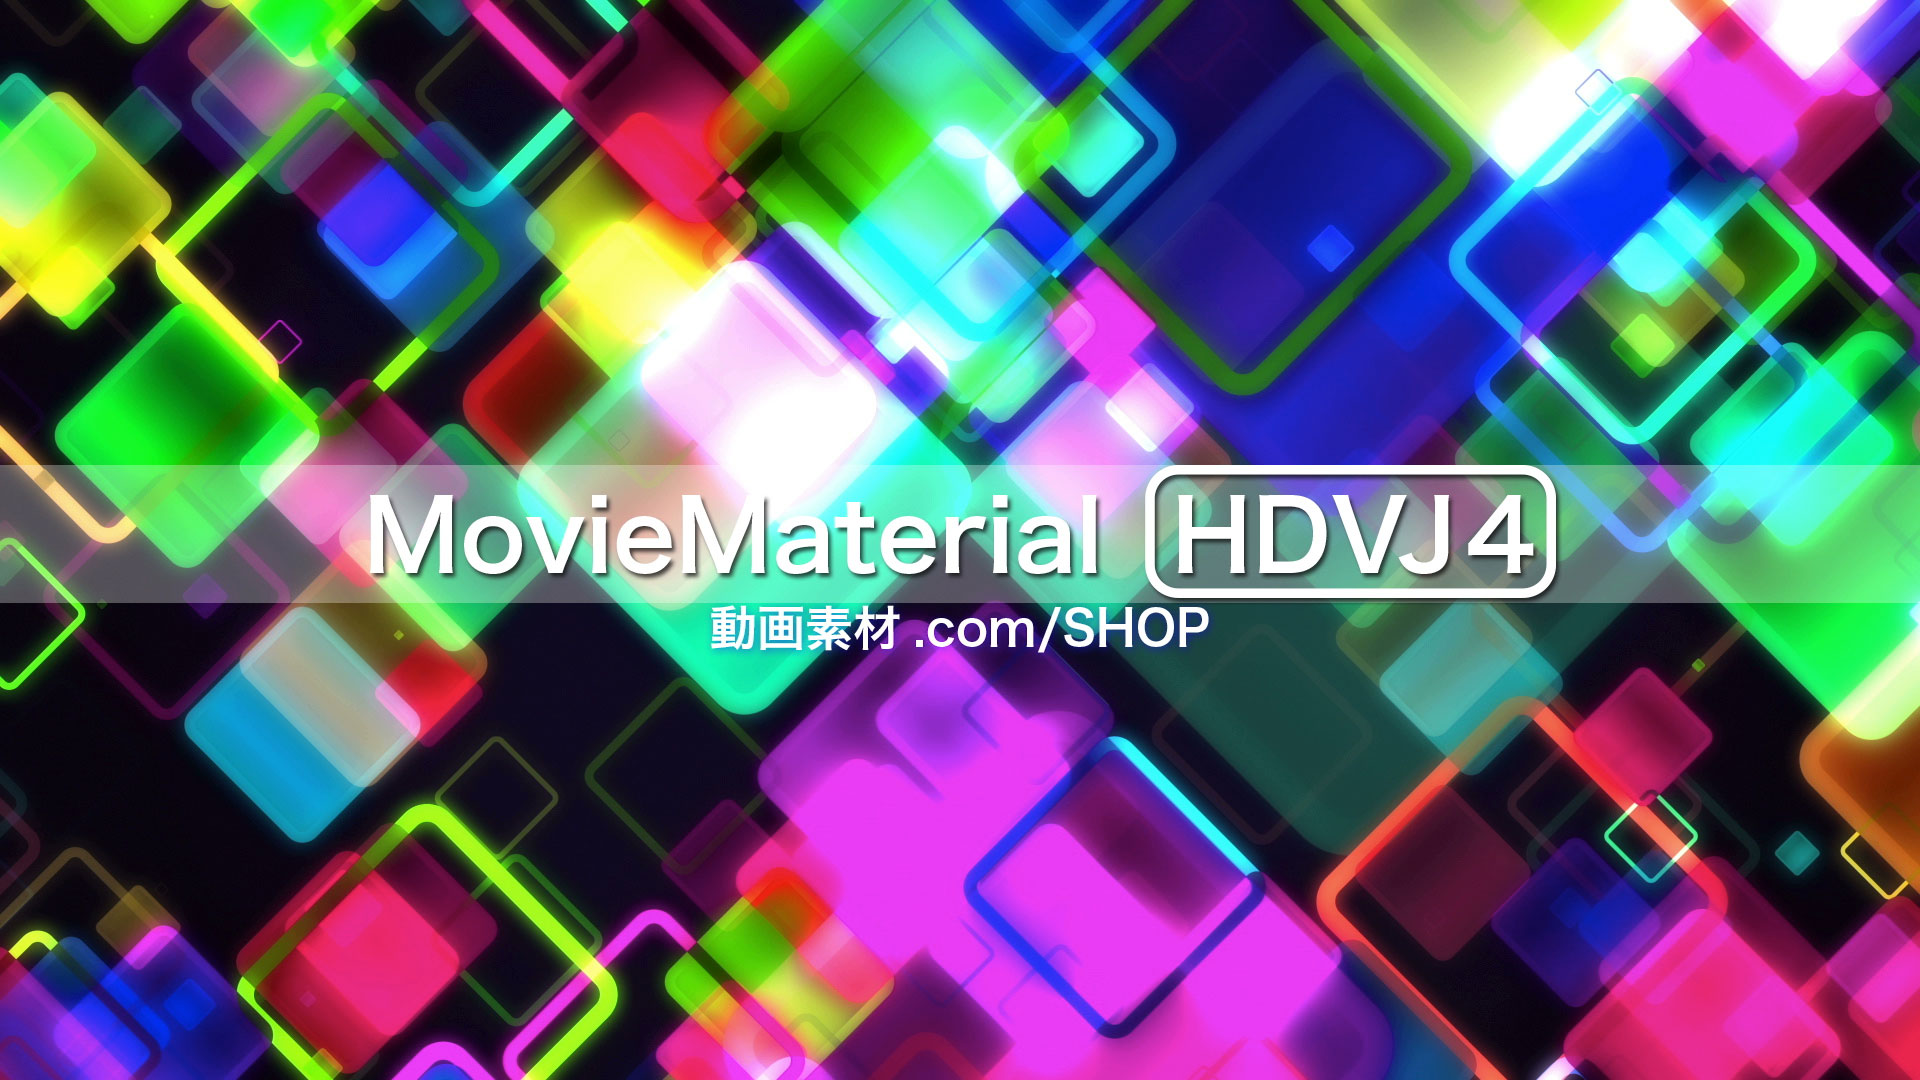 MovieMaterial HDVJ4 フルハイビジョンVJ動画素材集 画像2